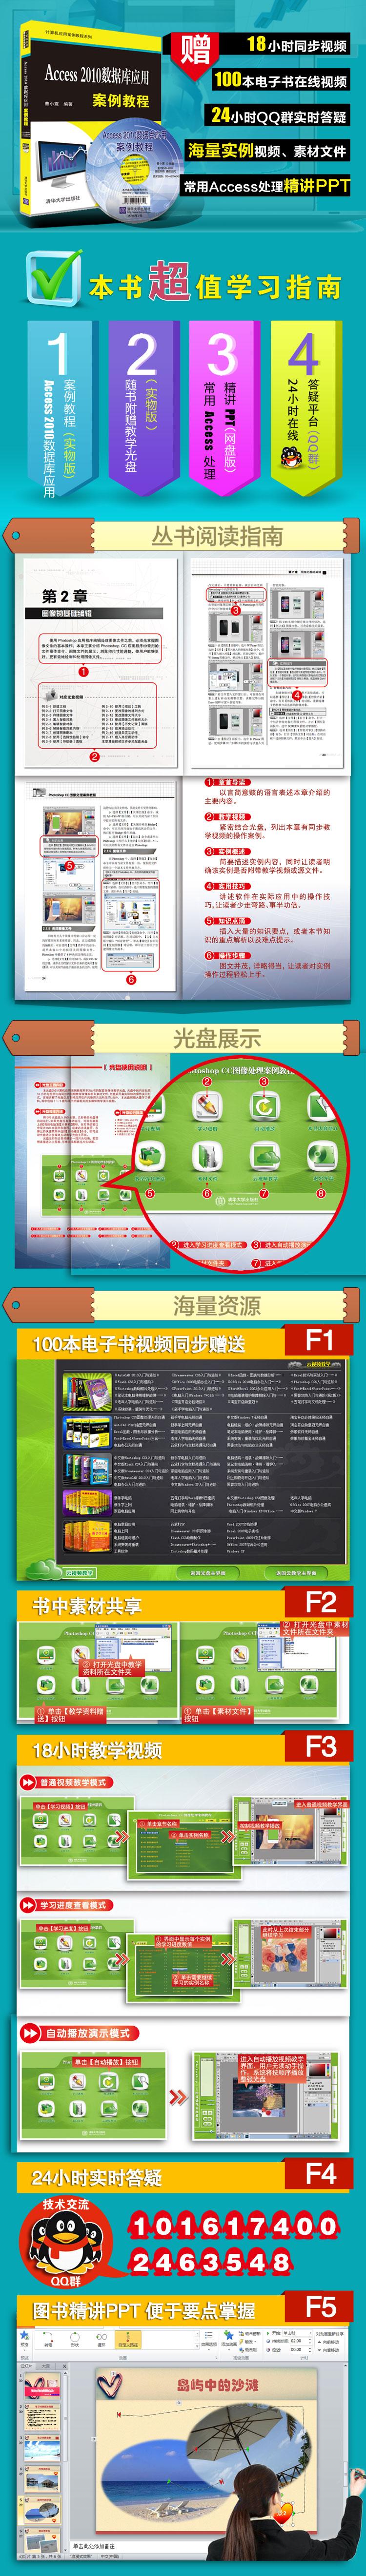 Access 2010数据库应用案例教程 PDF下载